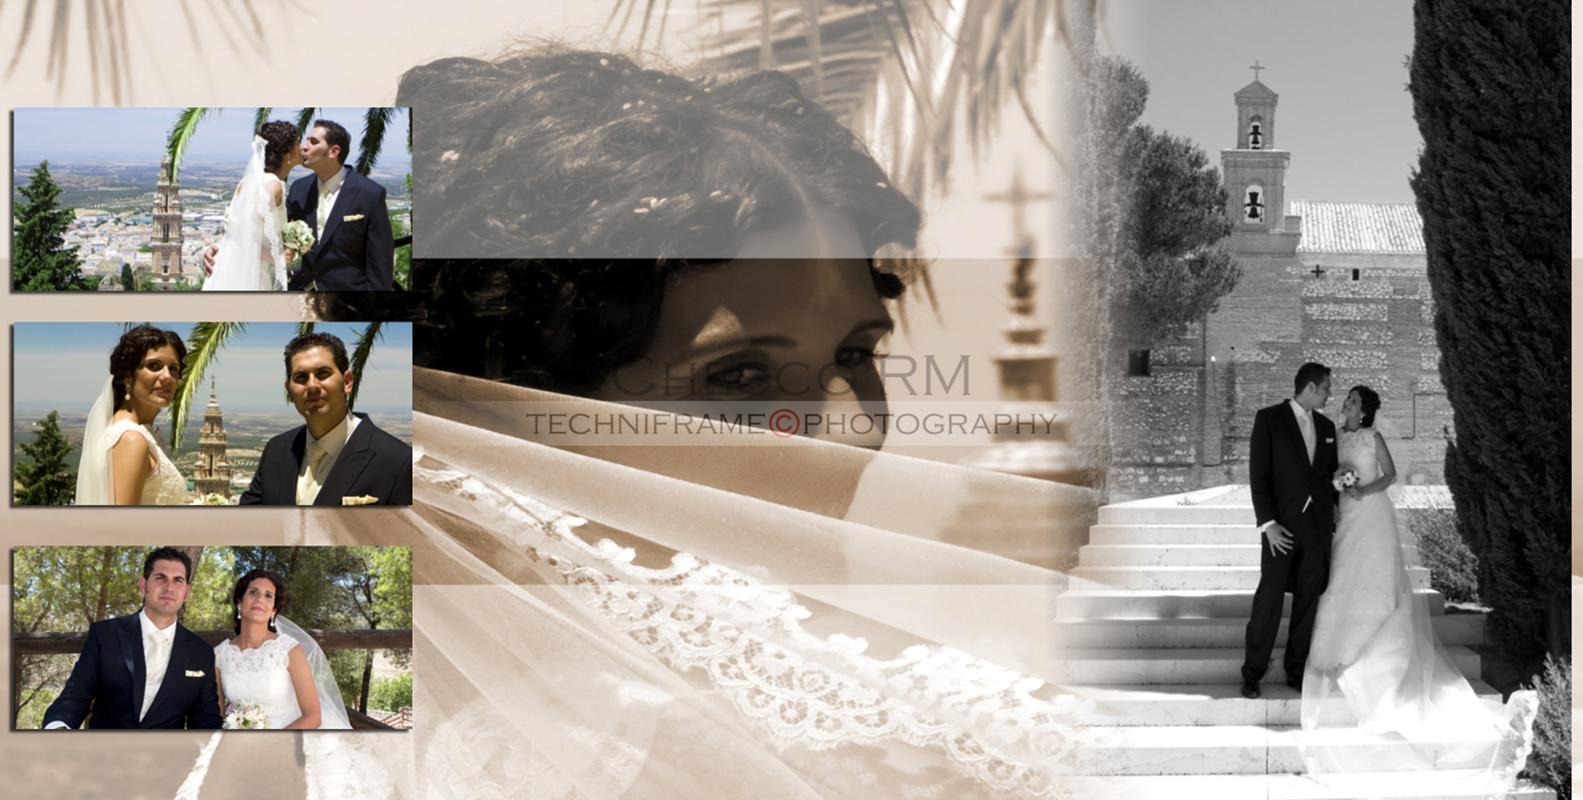 Sample wedding image